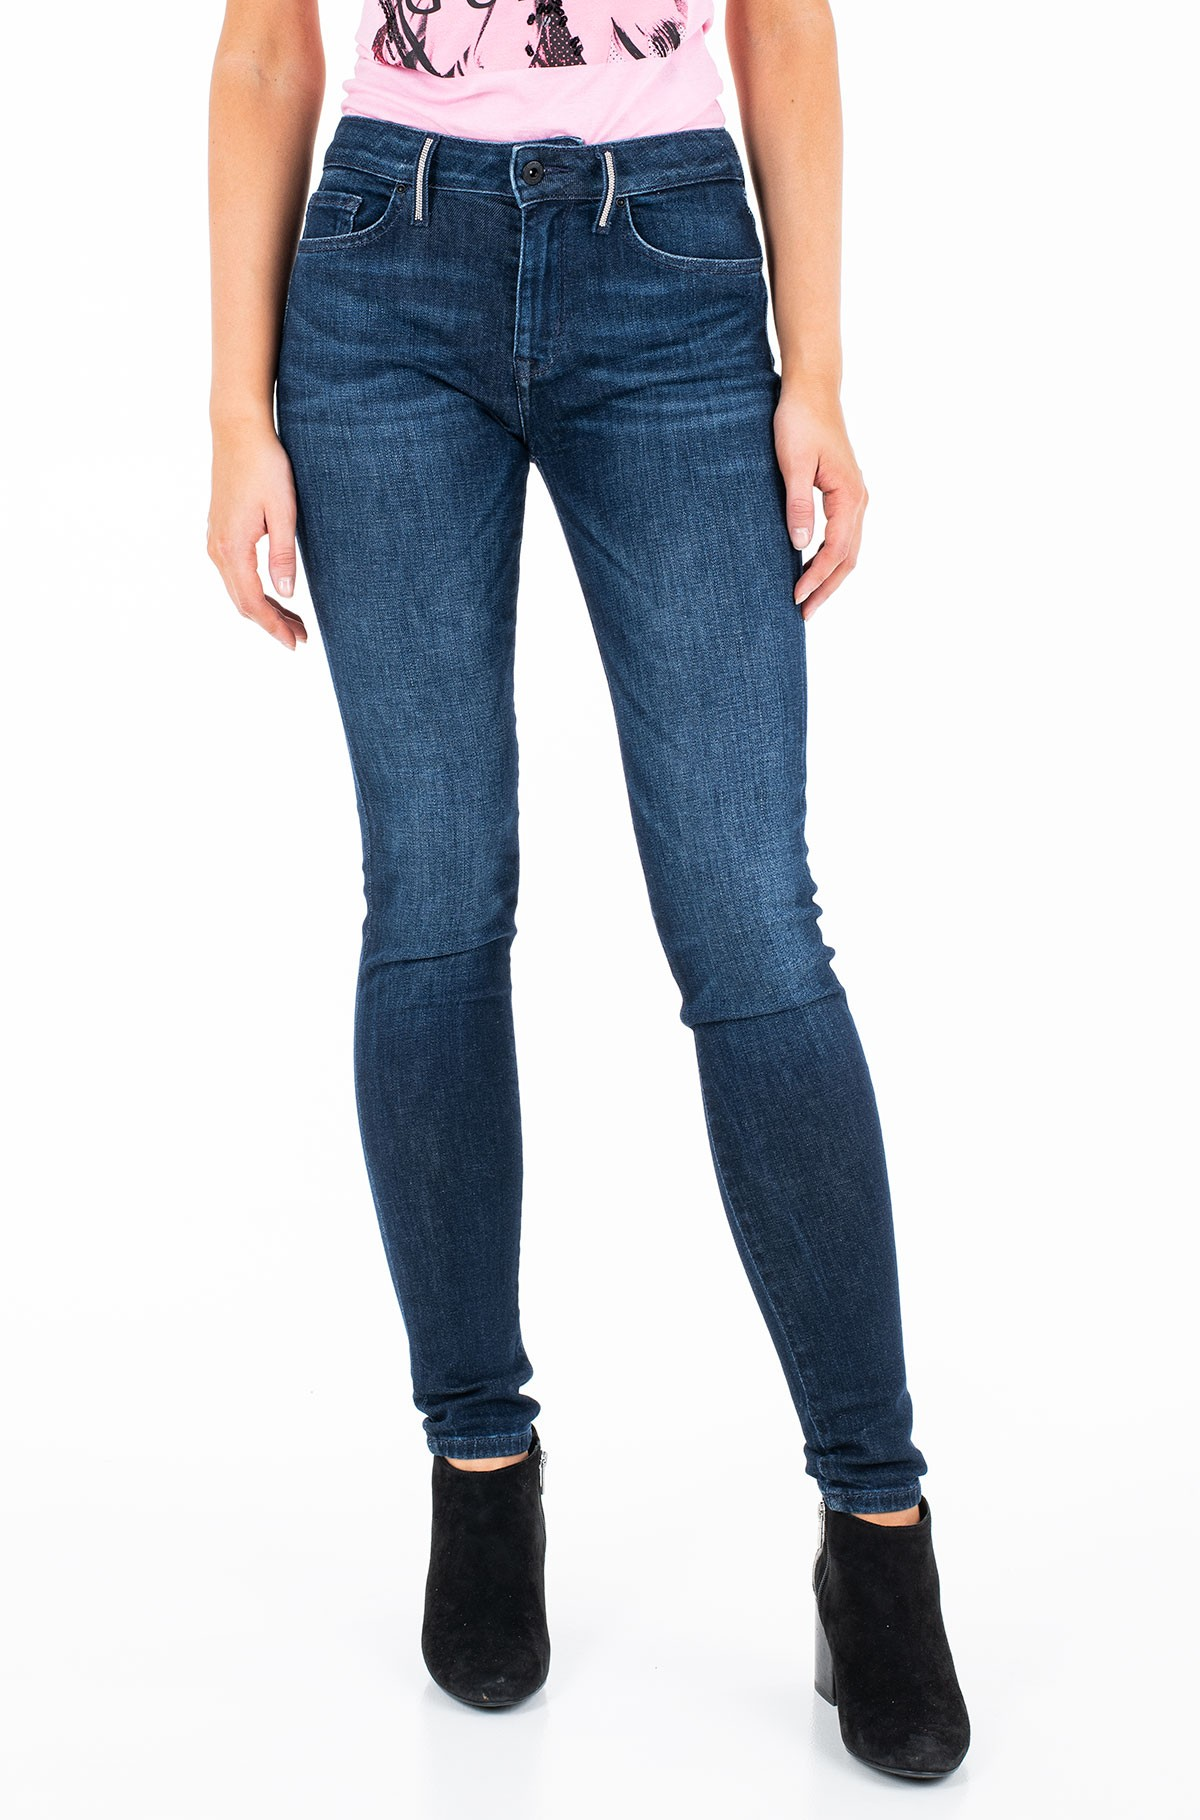 Jeans VENICE RW MYRA-full-1